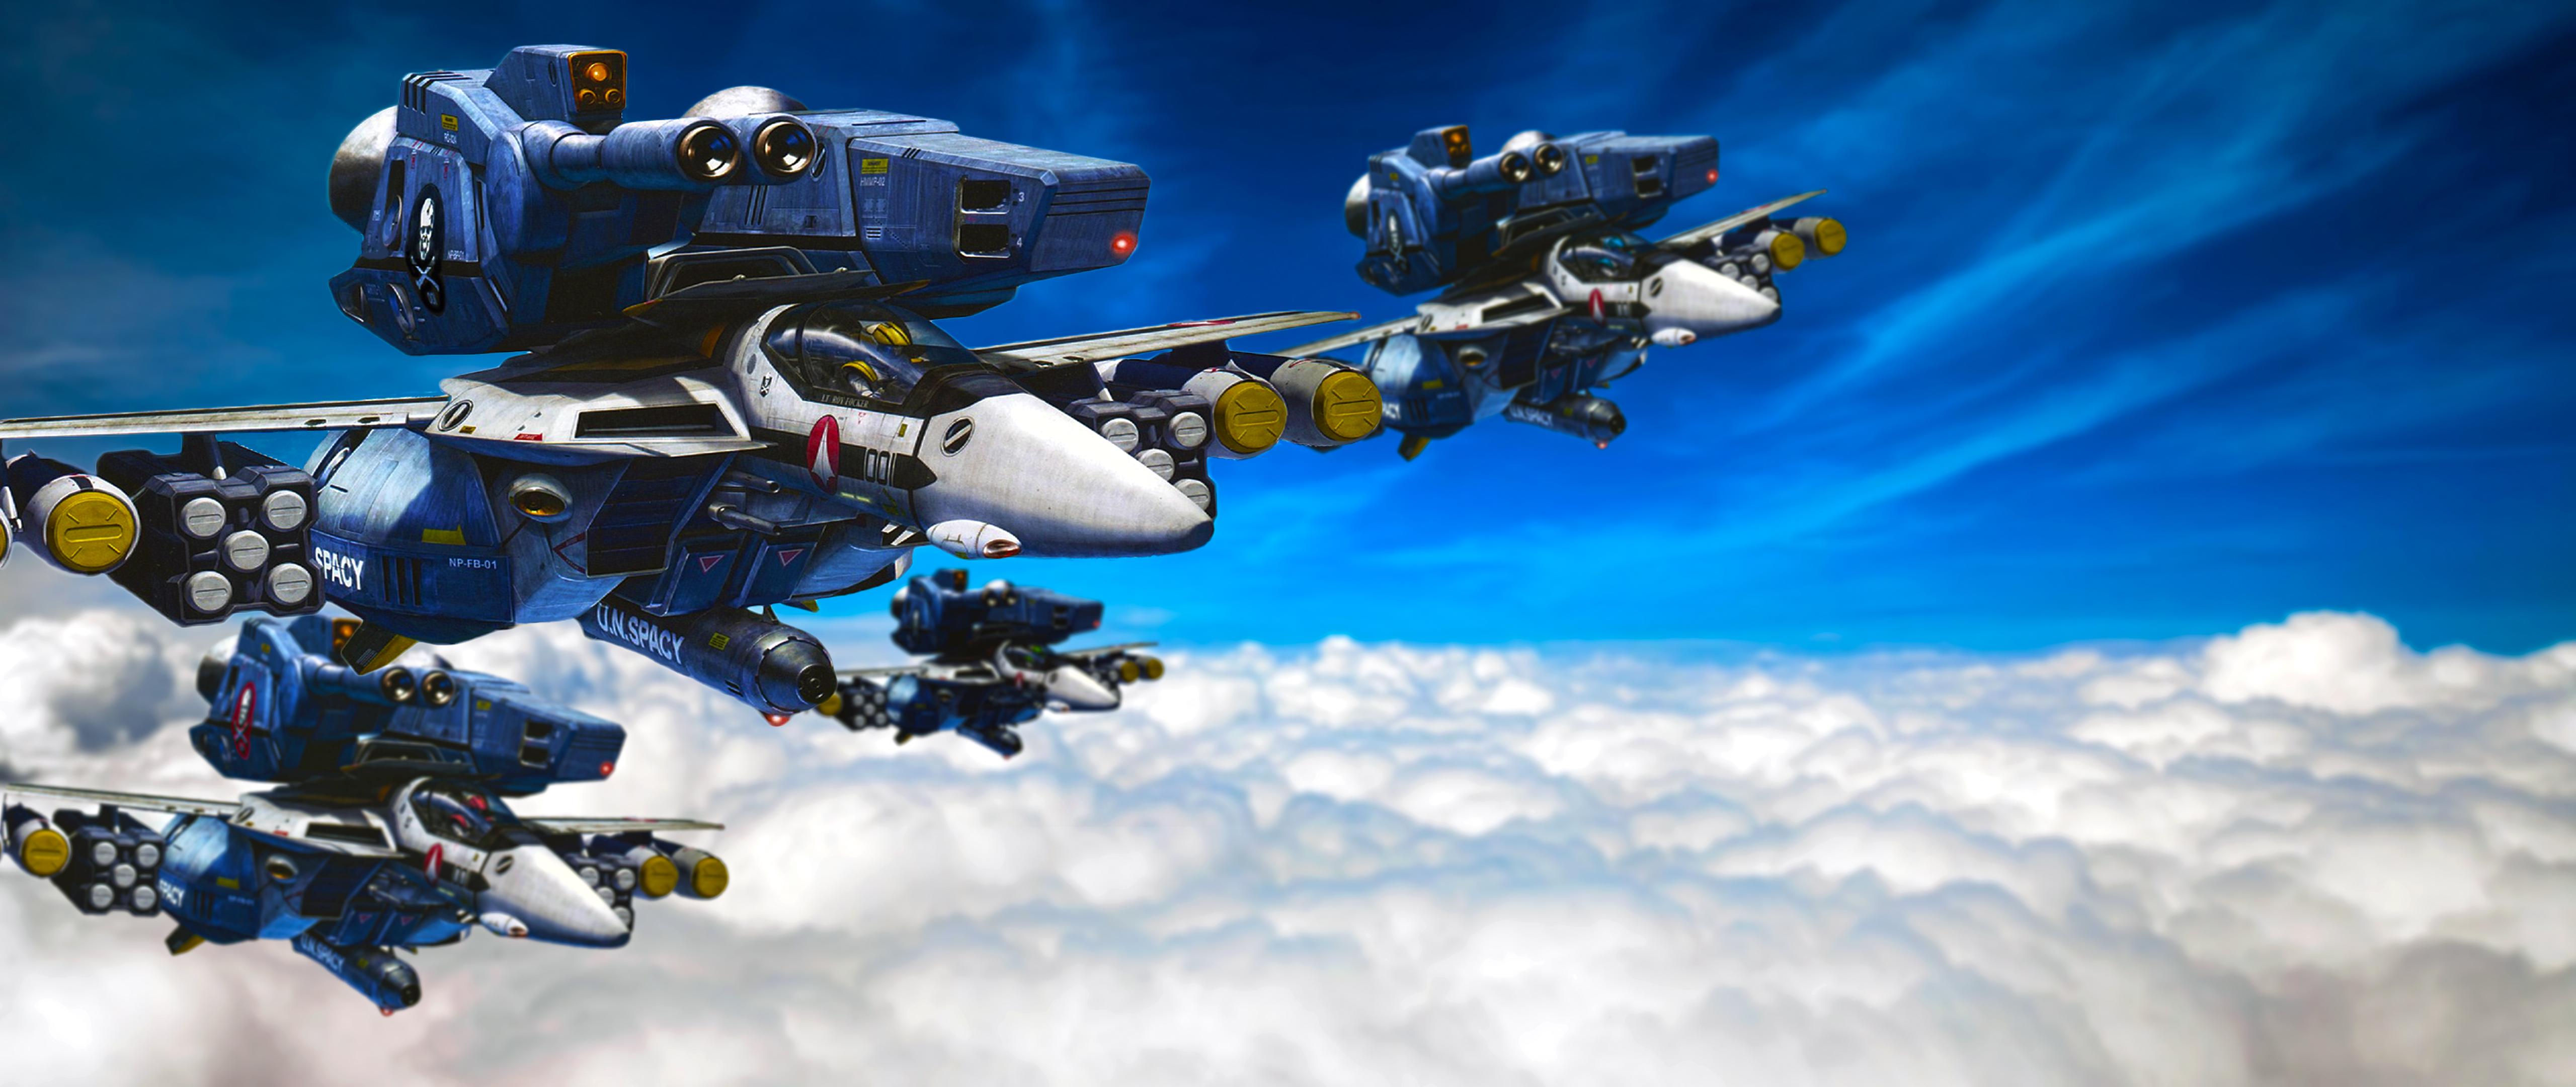 Robotech 4k Ultra HD Wallpaper | Background Image ...